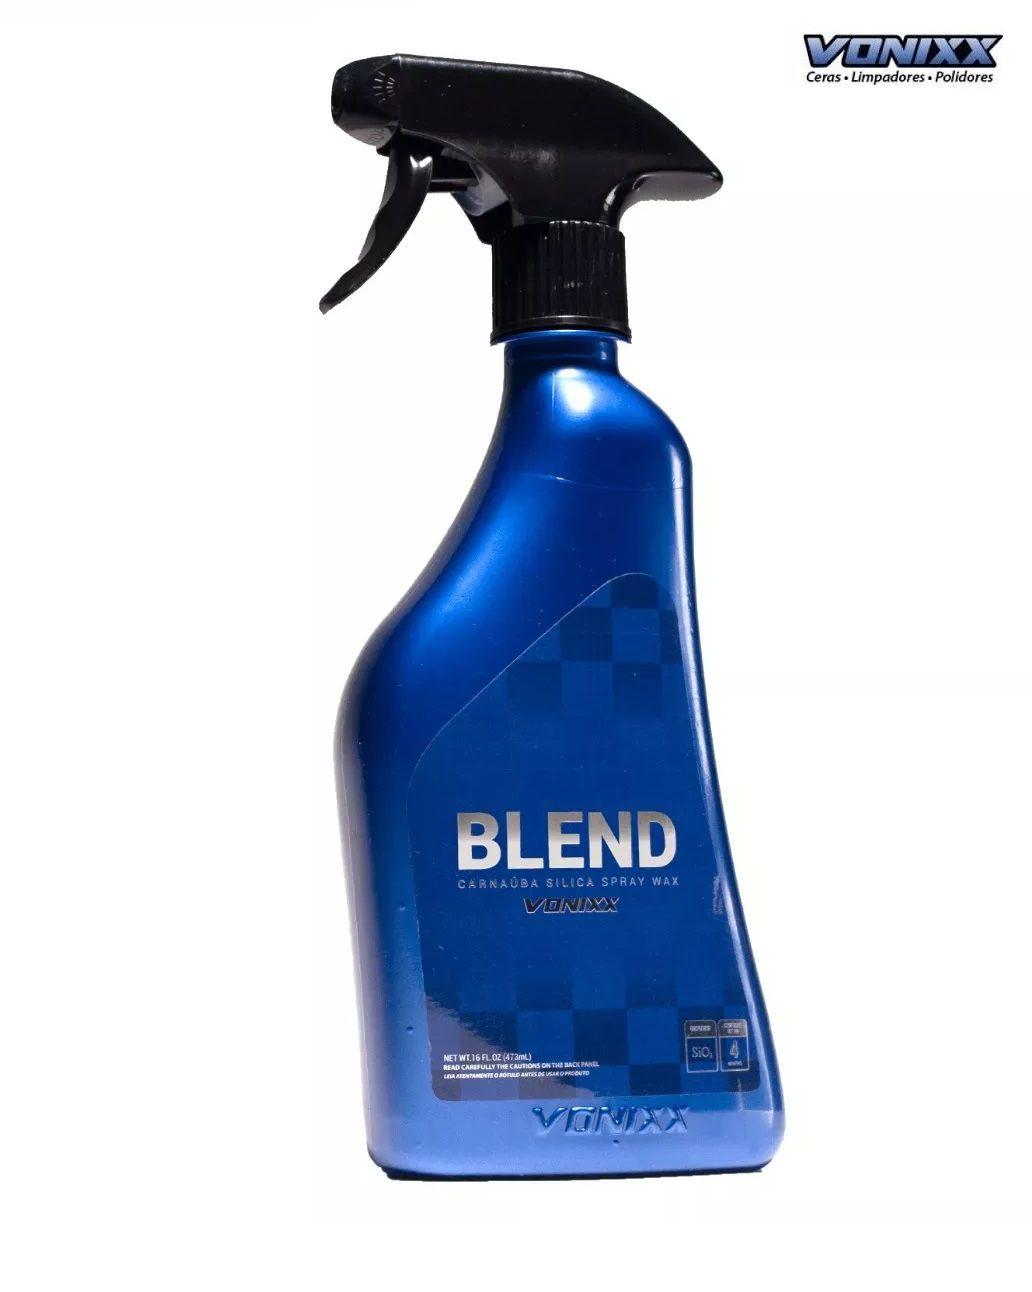 Cera Liquida Blend Carnaúba Spray Vonixx 473ml +2MICR. + apl